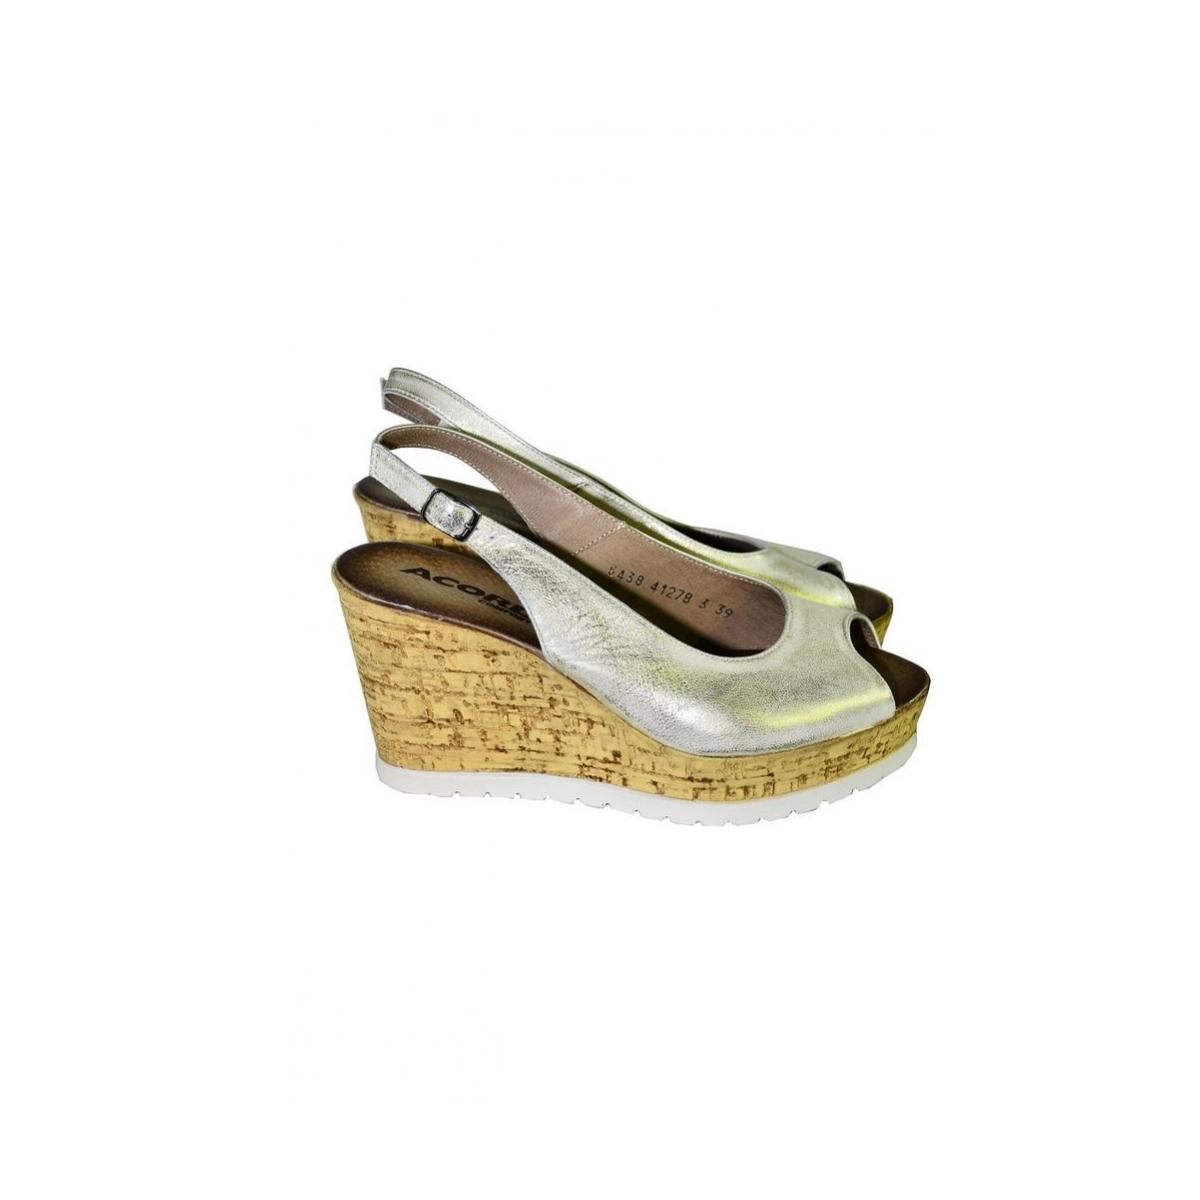 71be39ed42a5 Dámske letné zlaté sandále NETANA - 3